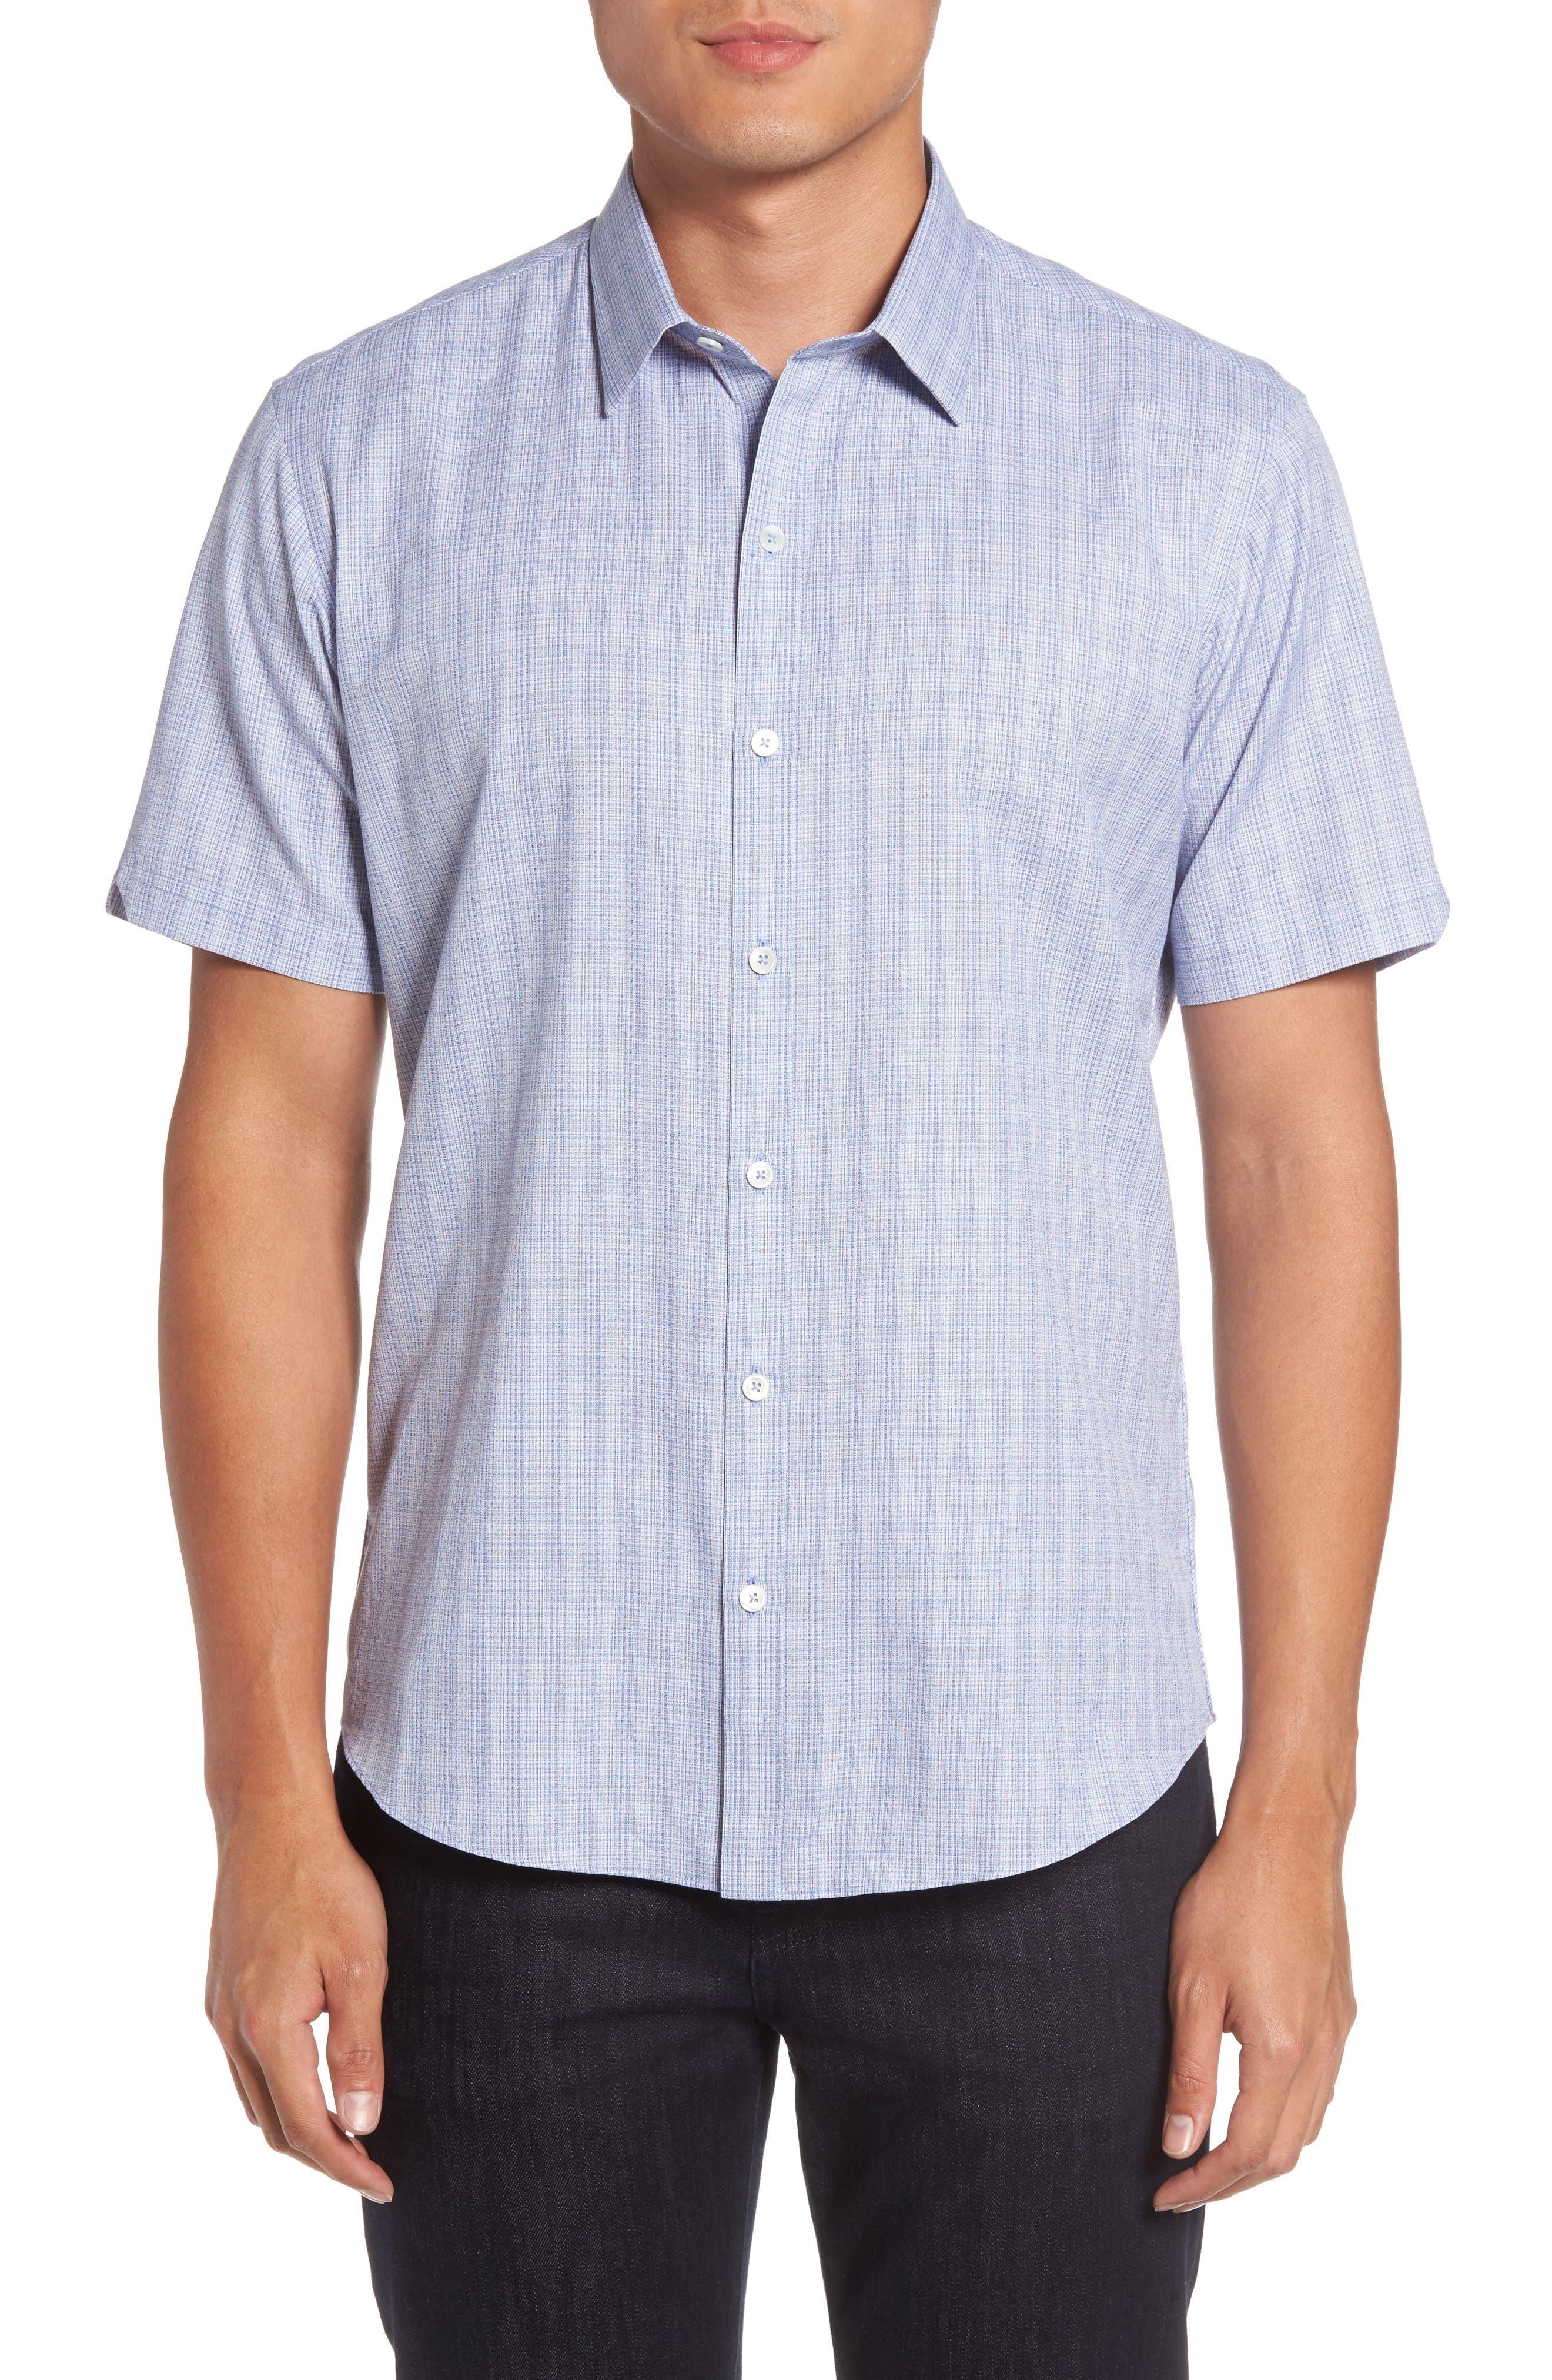 Zimmerman Check Sport Shirt,                         Main,                         color, 400